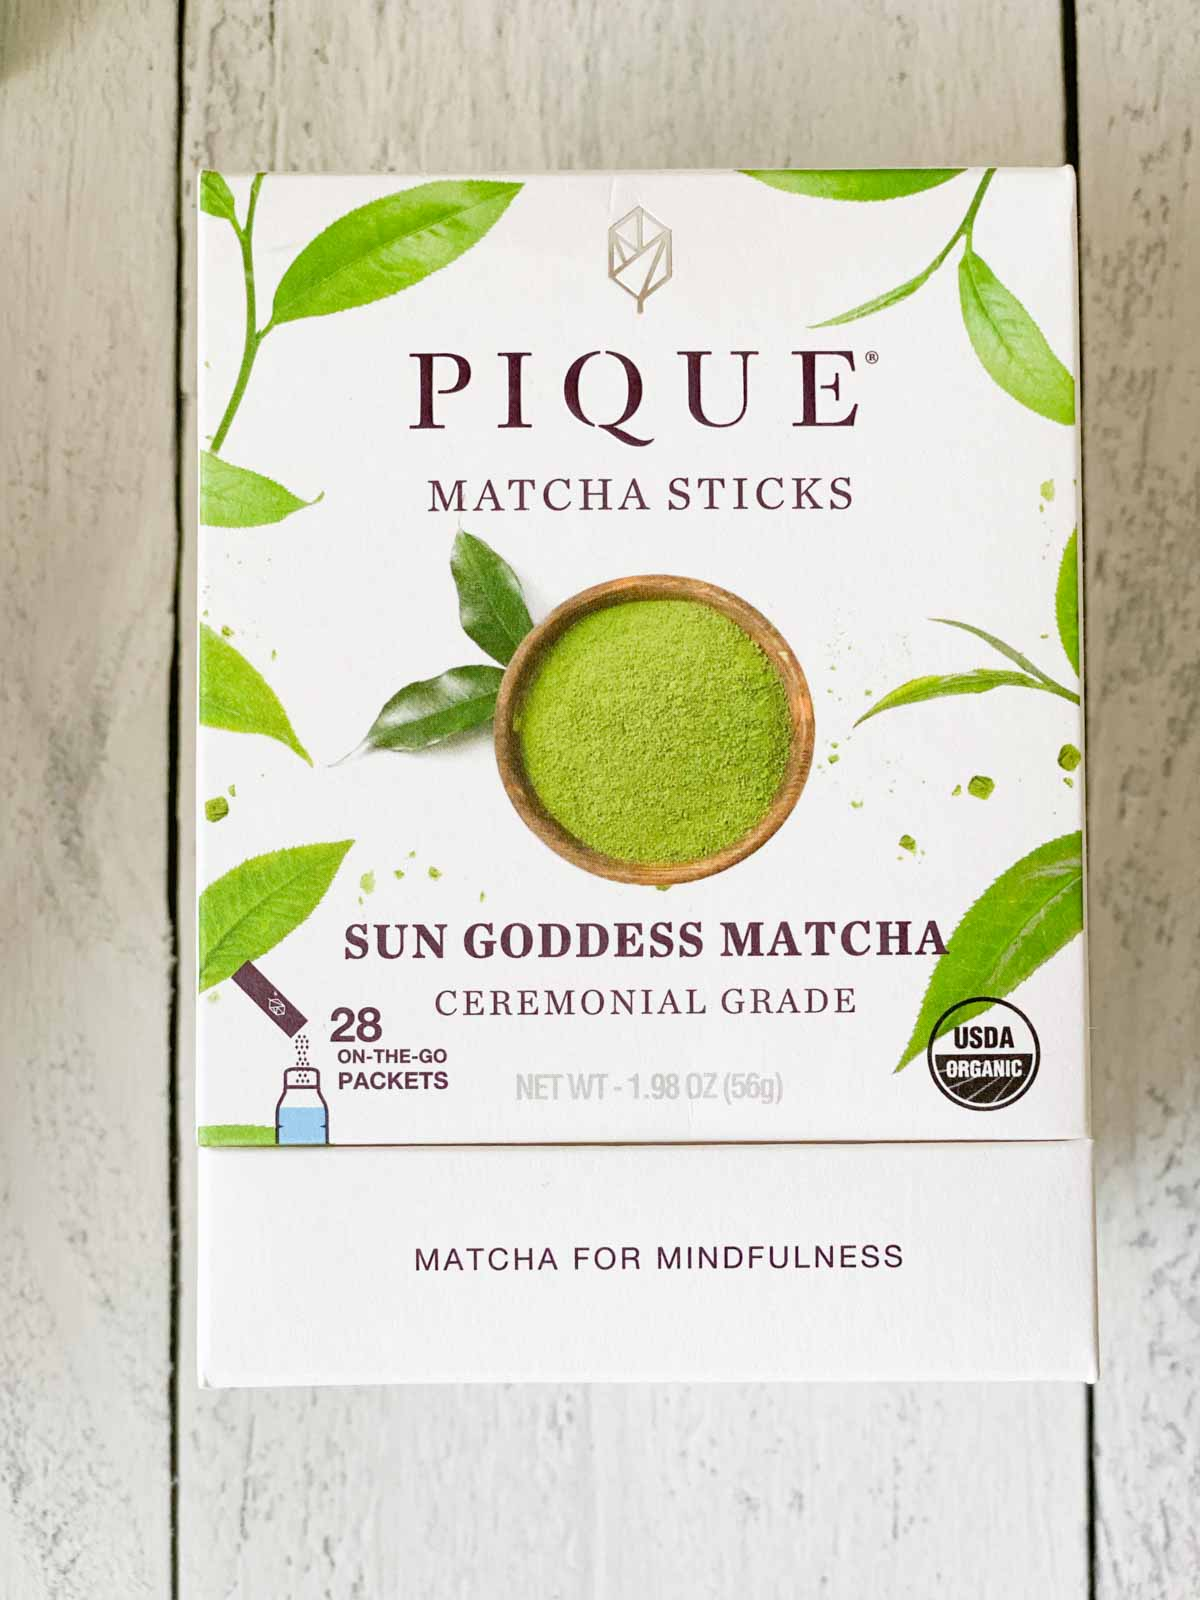 pique matcha sticks sun goddess matcha box